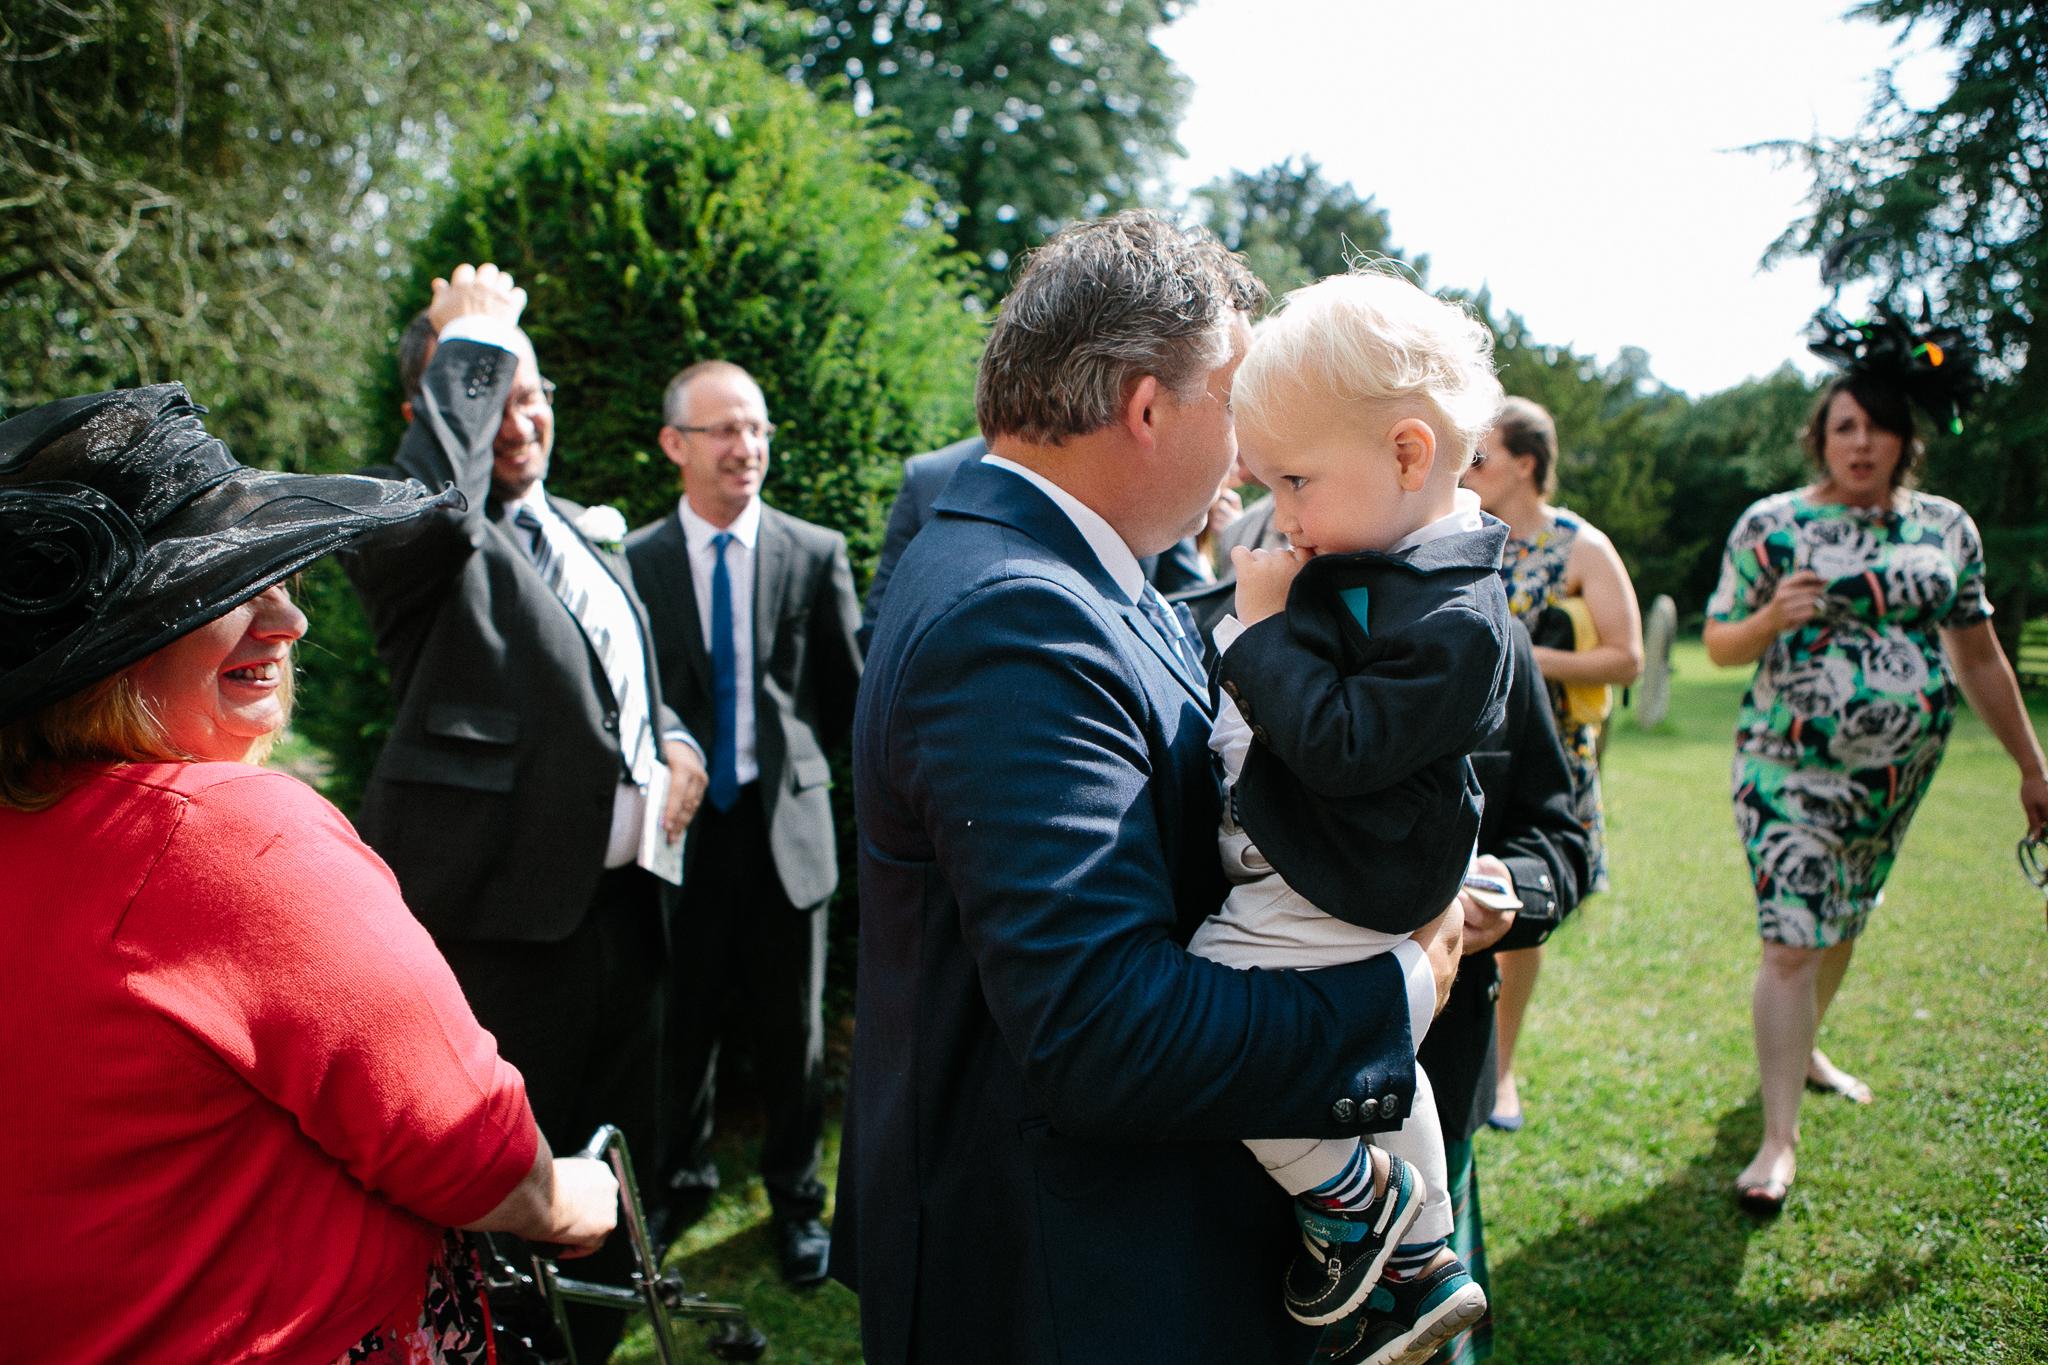 grantham_wedding_photographer-63.jpg